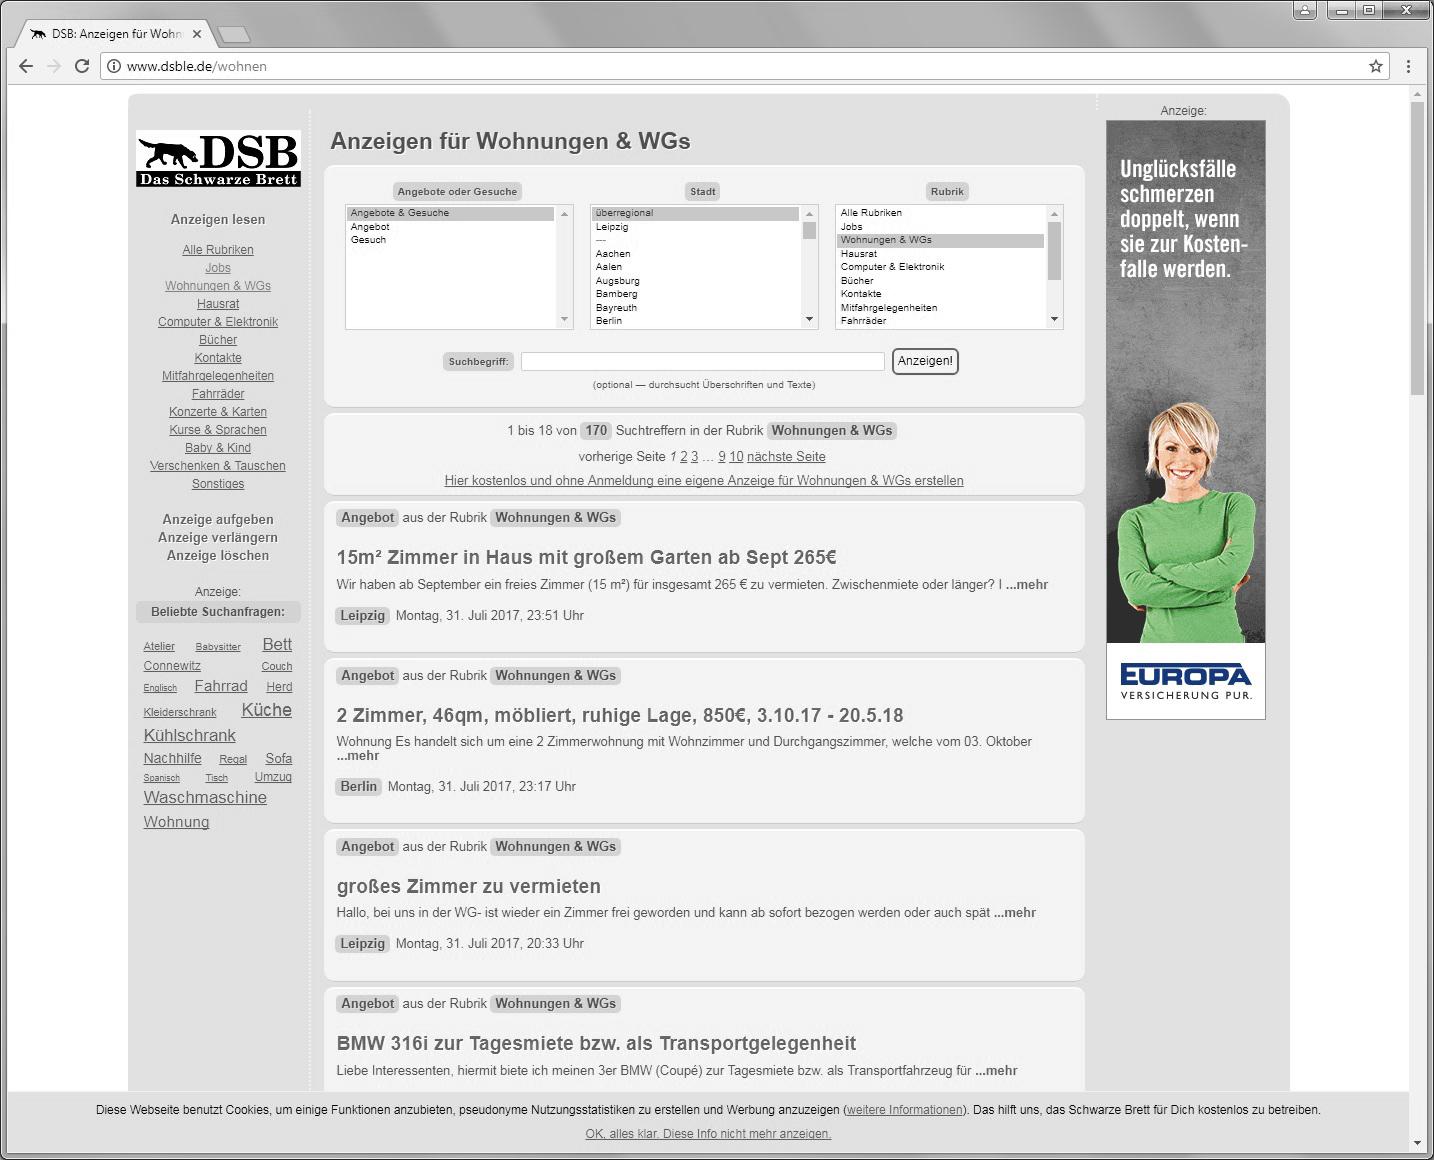 dsble.de, Online Marketing, Image Kampagne, Skyscraper